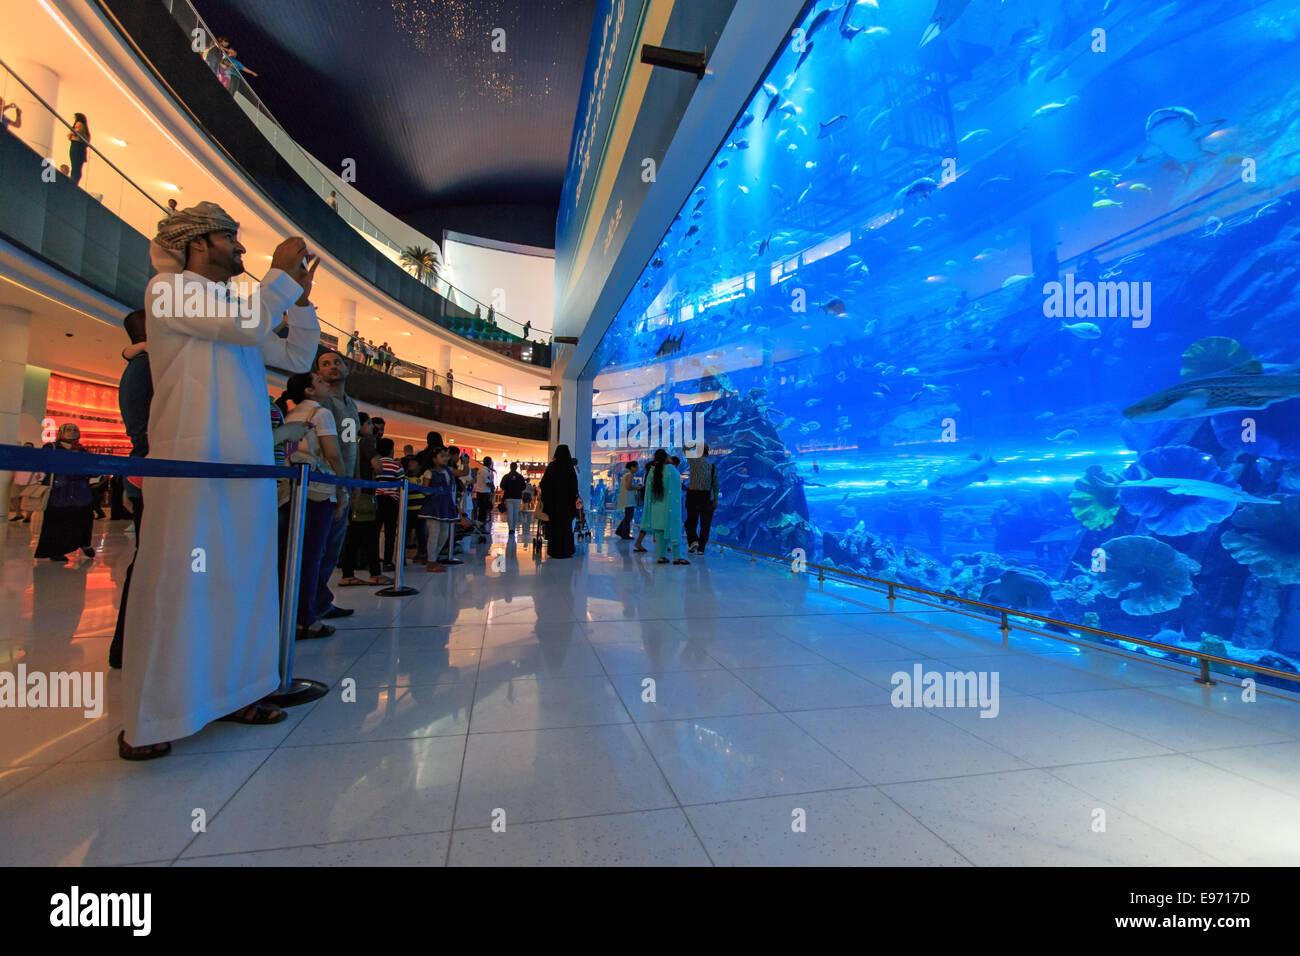 DUBAI, EMIRATOS ÁRABES UNIDOS - Octubre 07,2014: Acuario en Dubai Mall, el centro comercial más grande Imagen De Stock